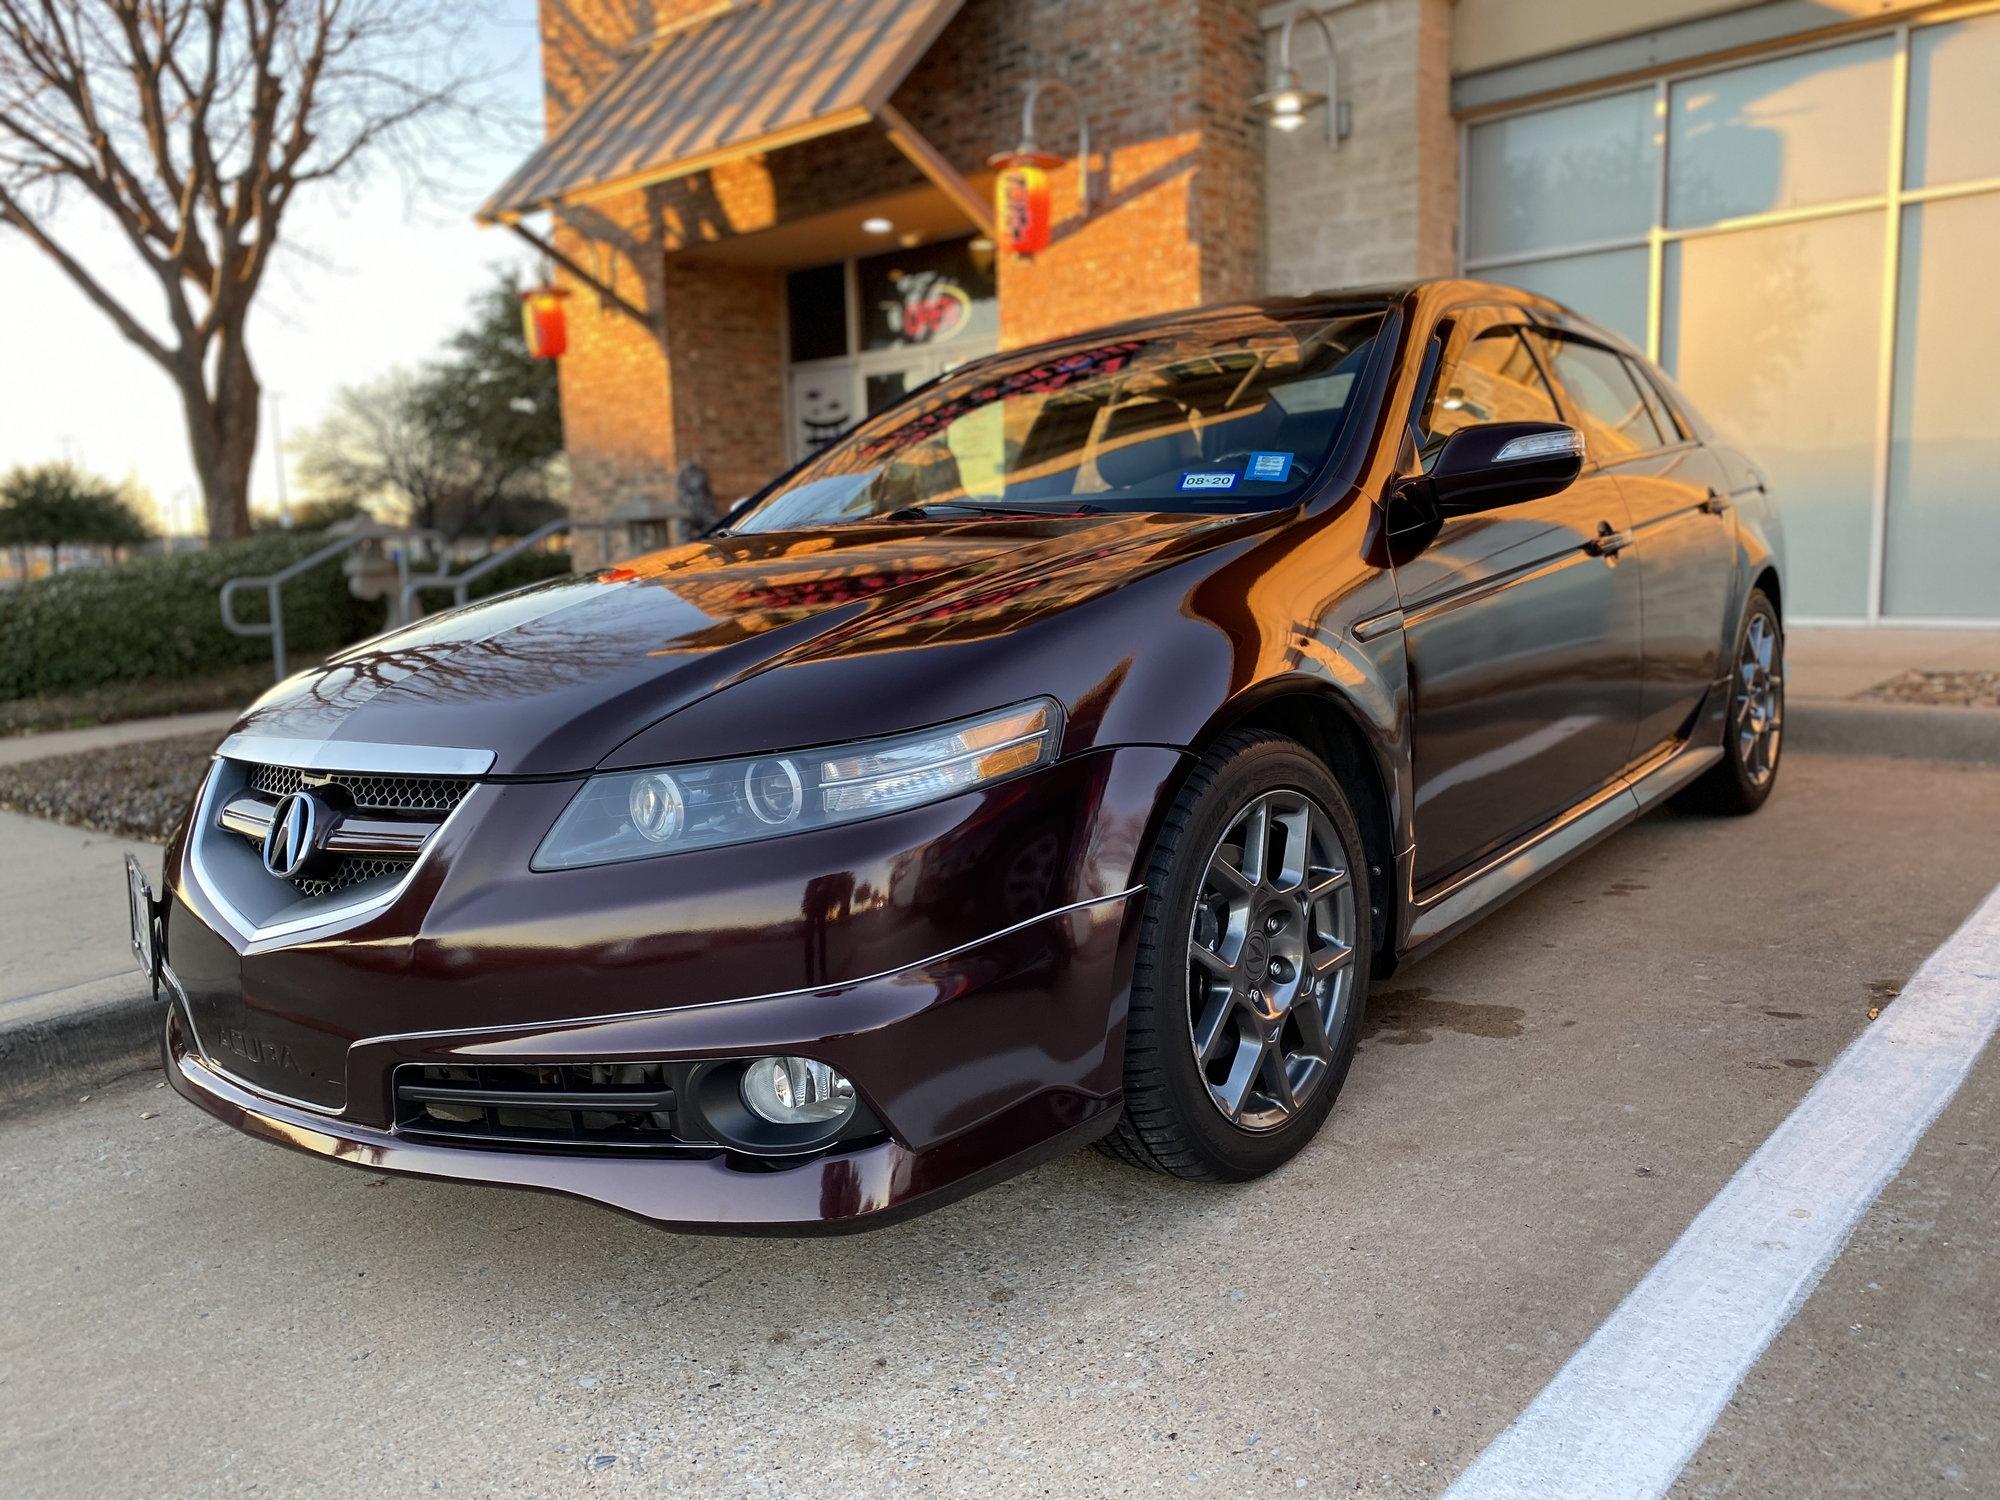 FS: Acura TL Type-S 6-Speed (Manual) - AcuraZine - Acura ...